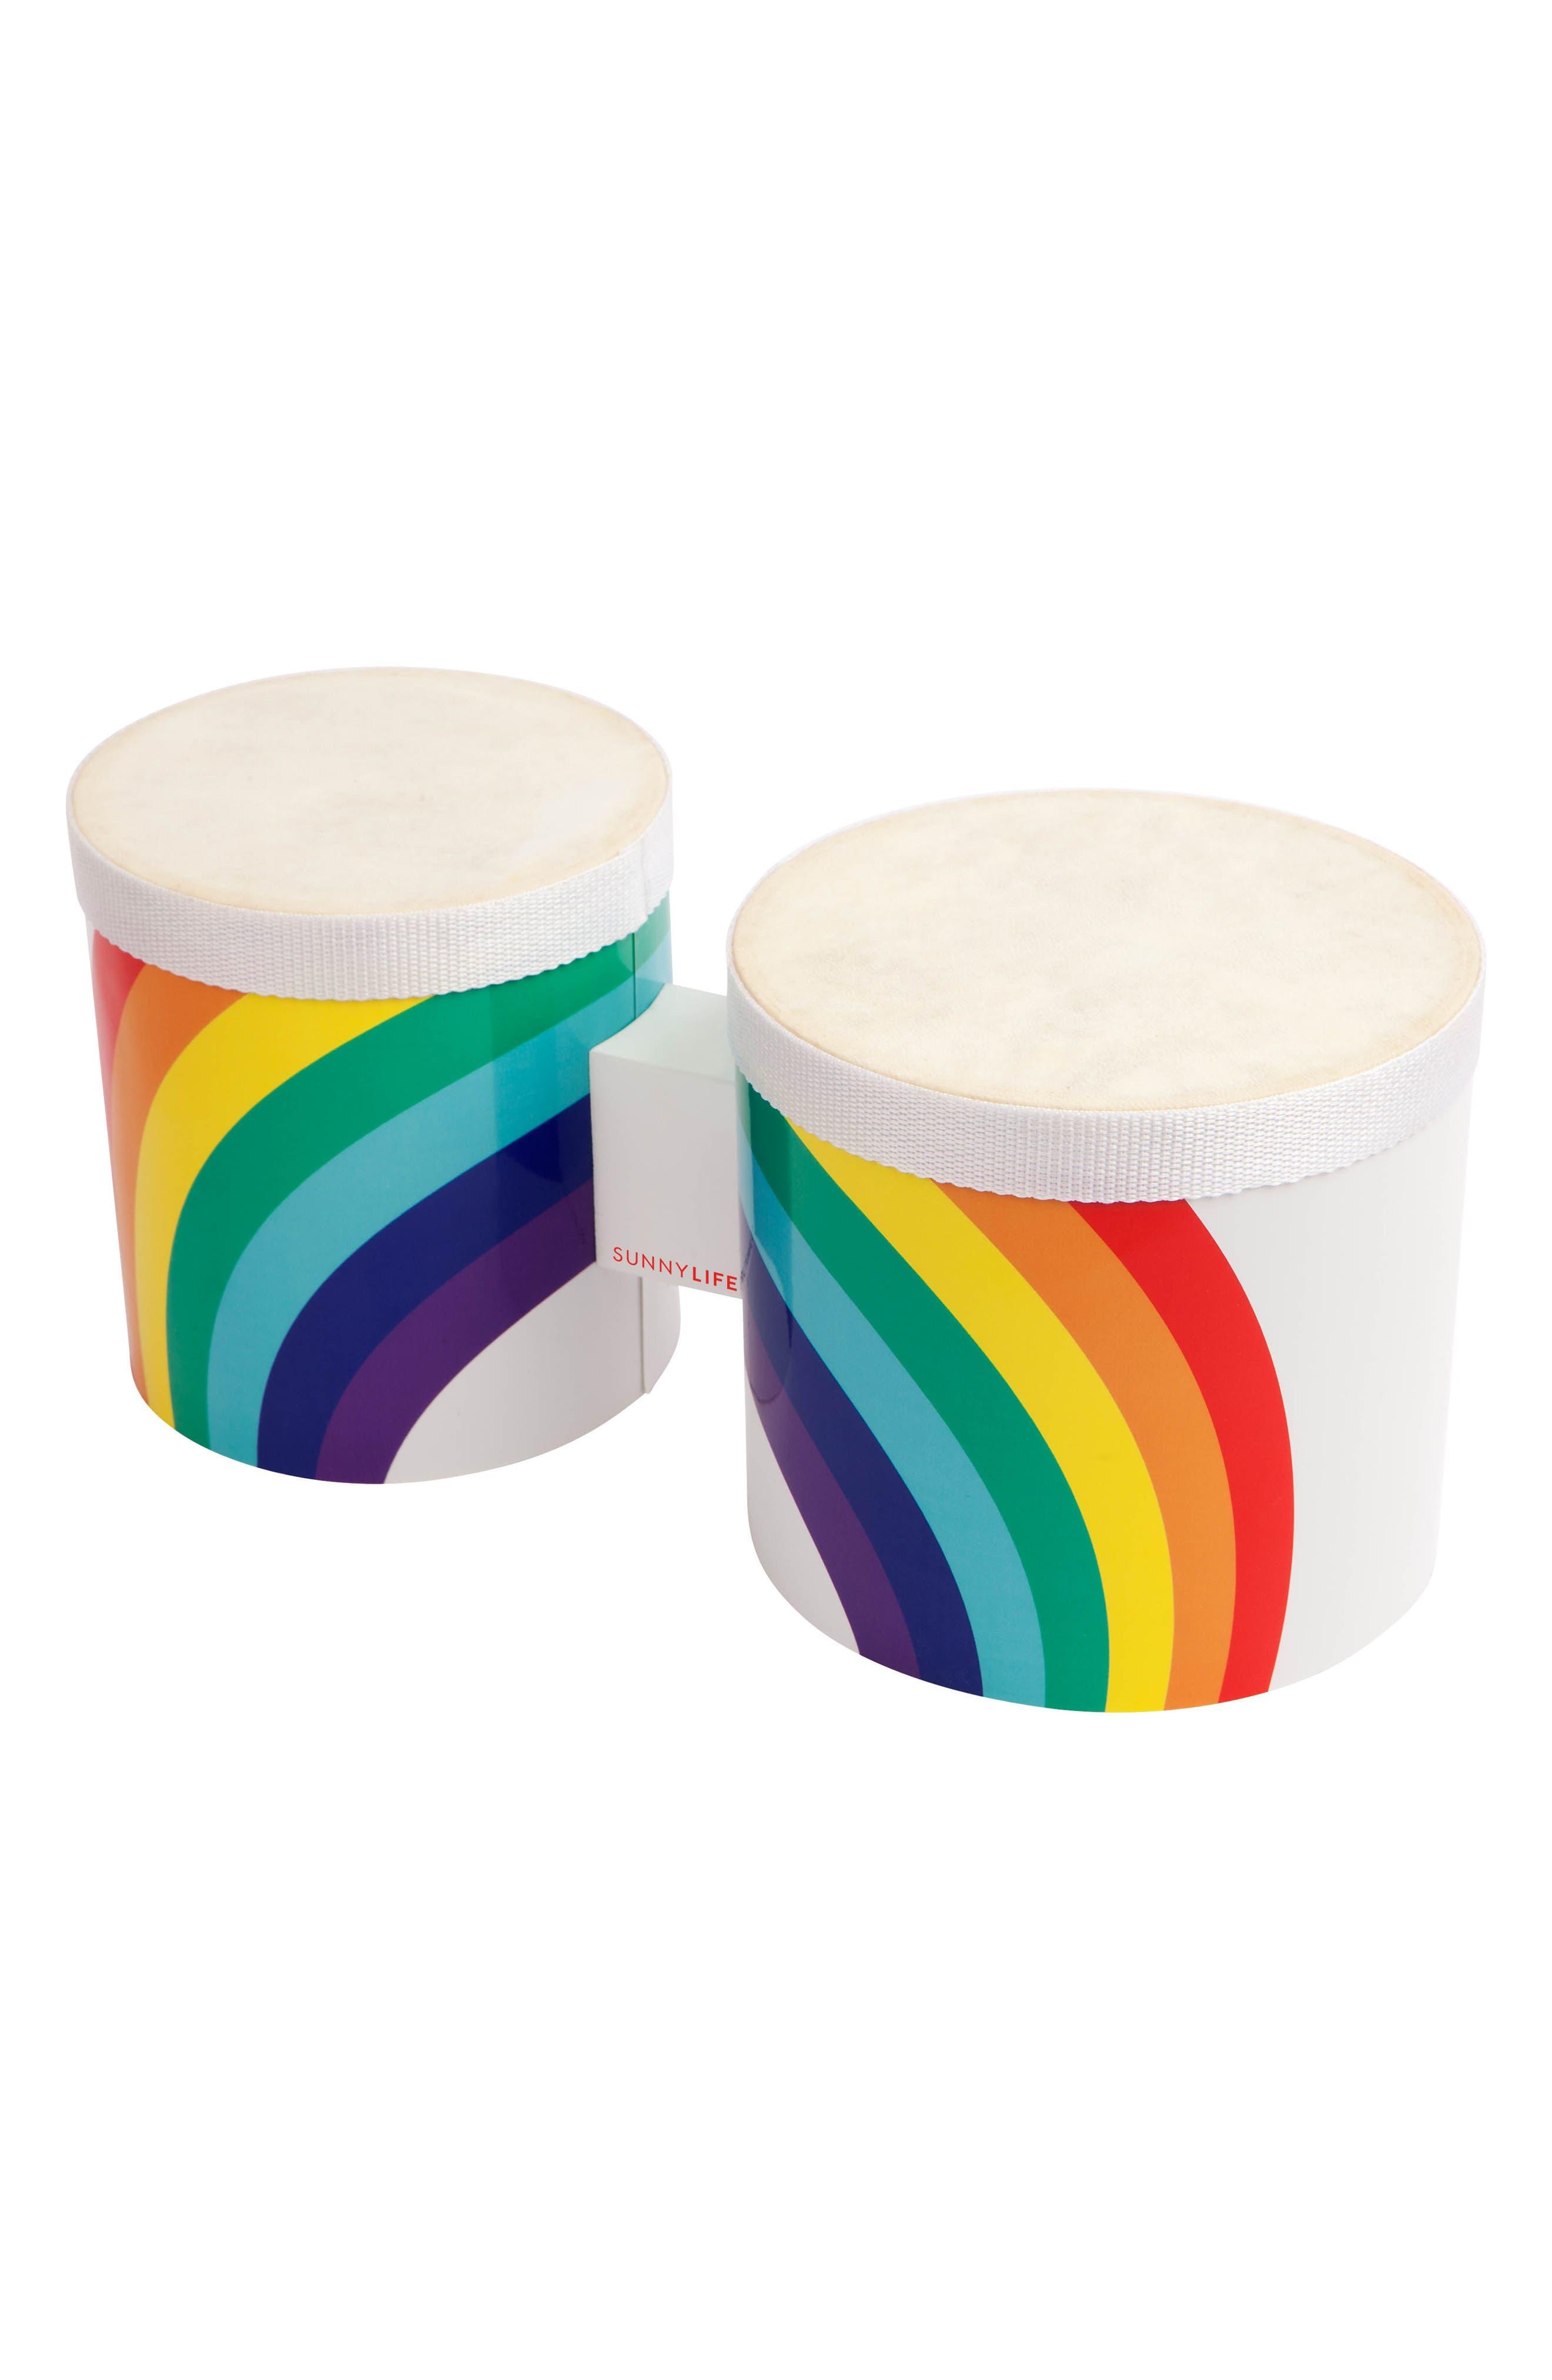 Rainbow Bongo Drums,                             Main thumbnail 1, color,                             600